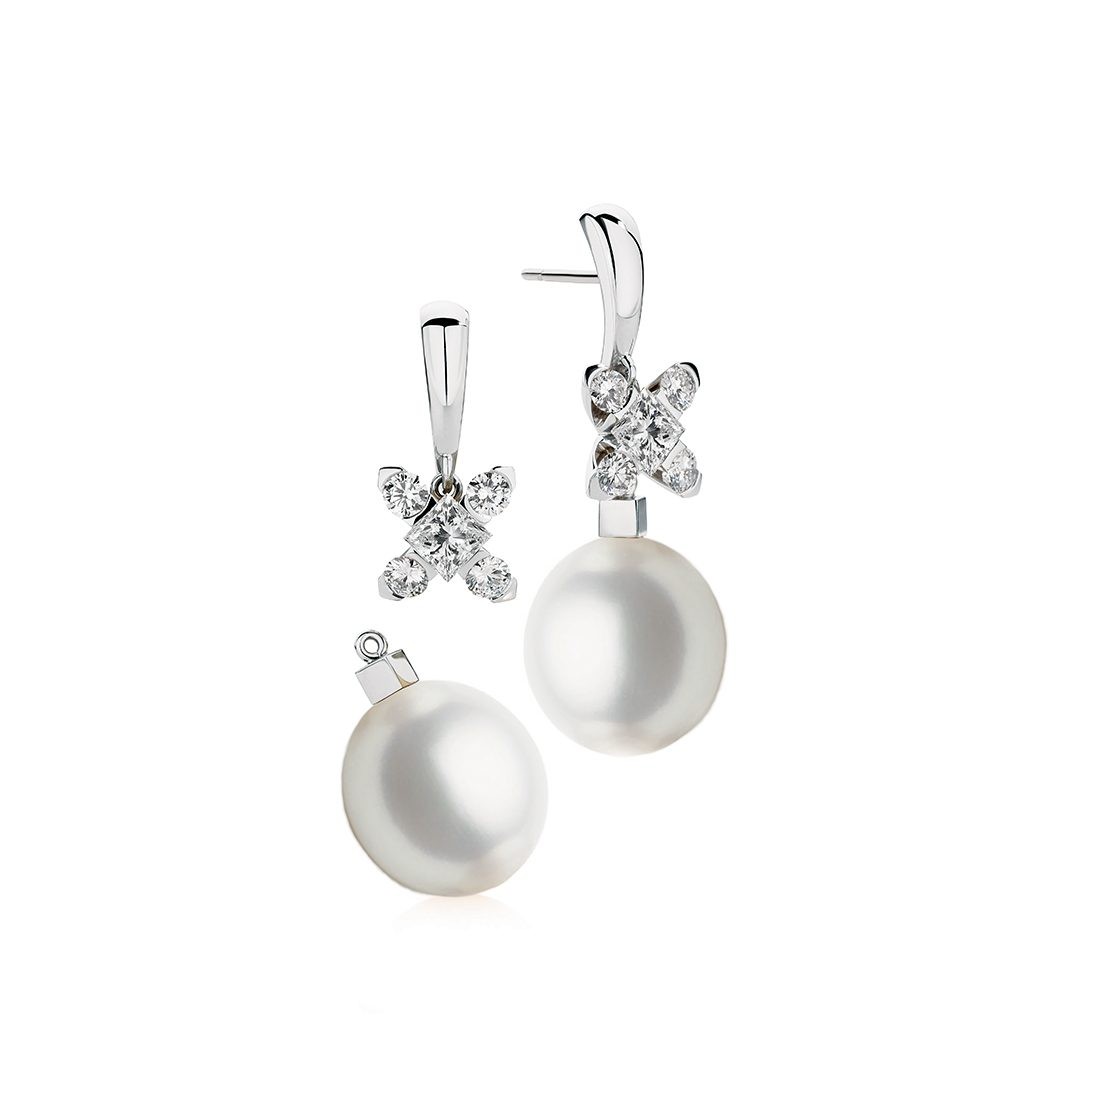 Snowflake Pearl and Diamond Earrings